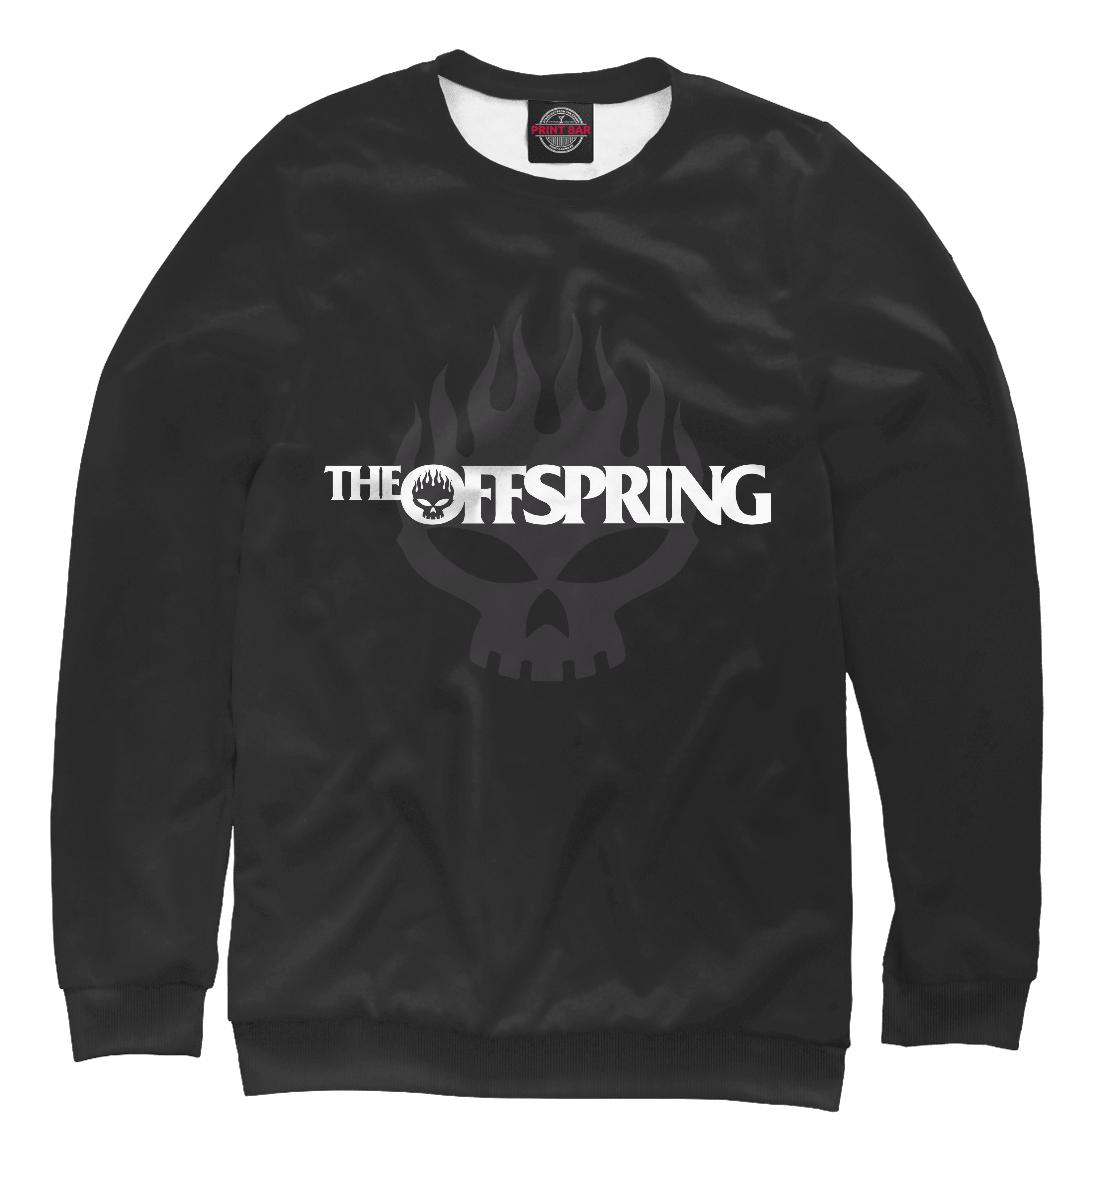 Купить The Offspring, Printbar, Свитшоты, MZK-218385-swi-1